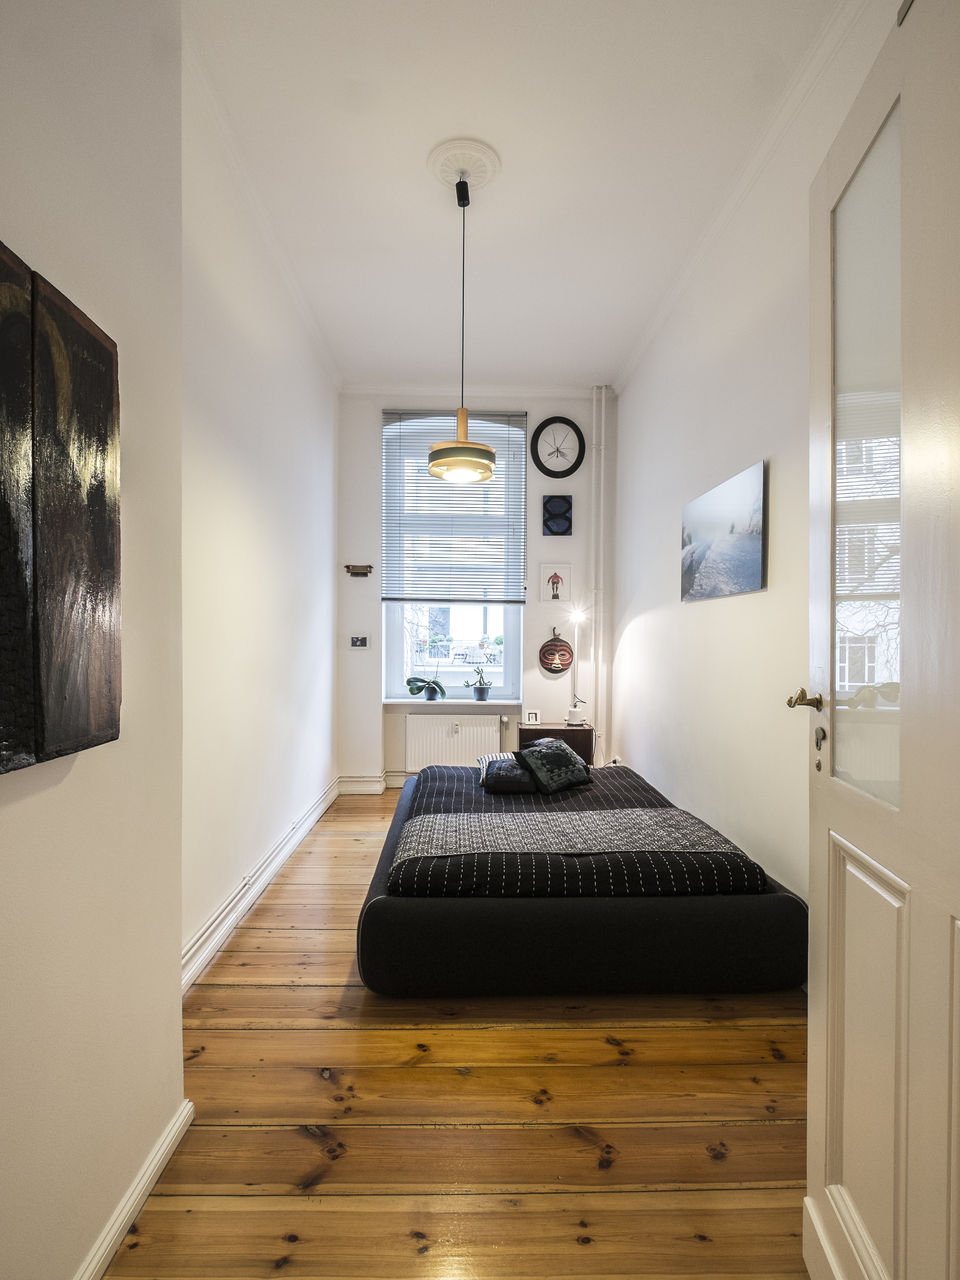 Modernisiertes altbau apartment in kreuzberg  farawayhome